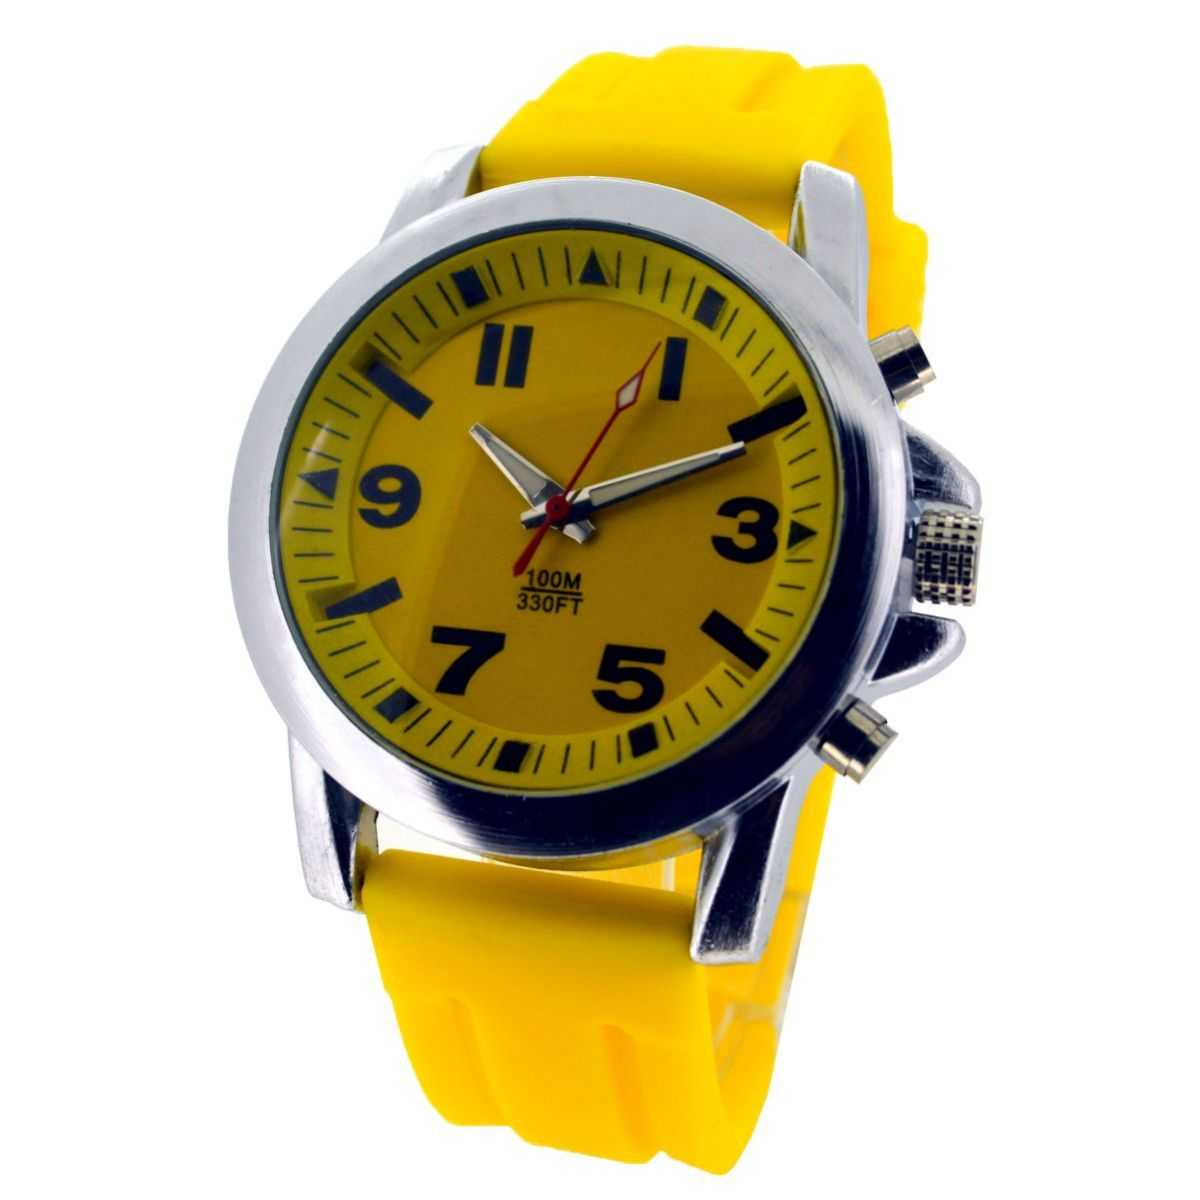 Relógio Personalizado 2463-5